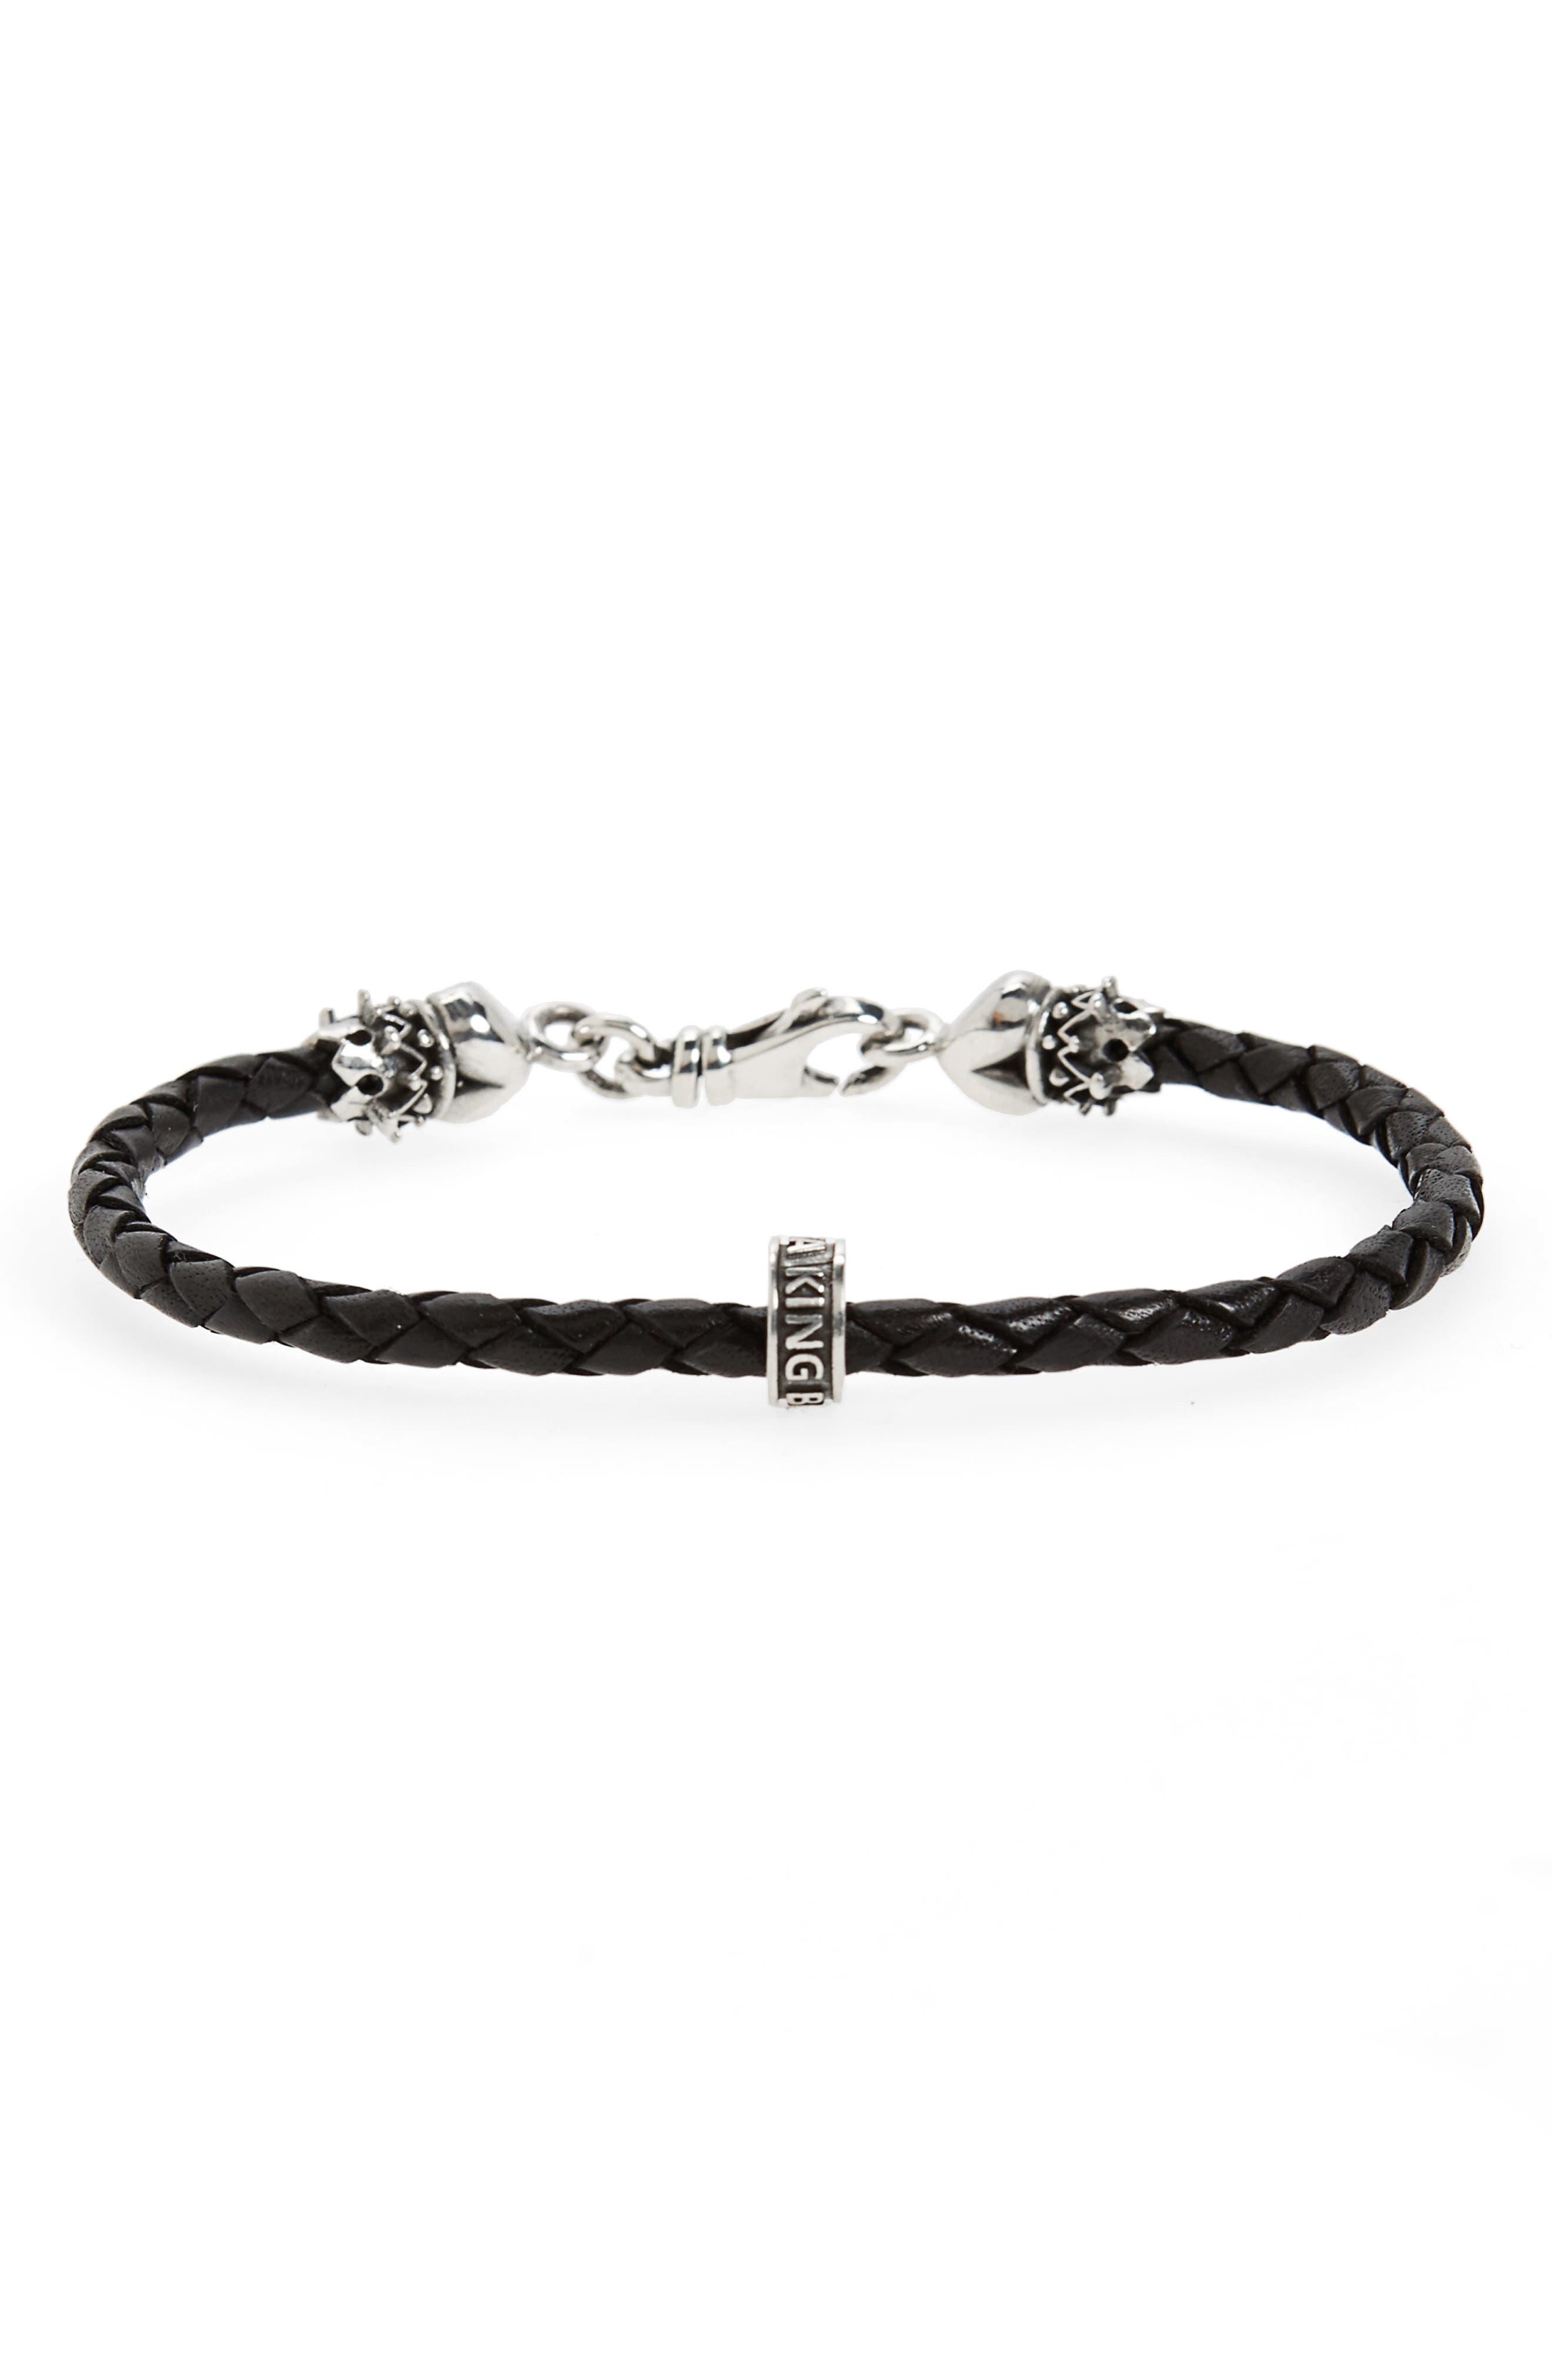 Braided Leather Bracelet,                         Main,                         color, Silver/ Black